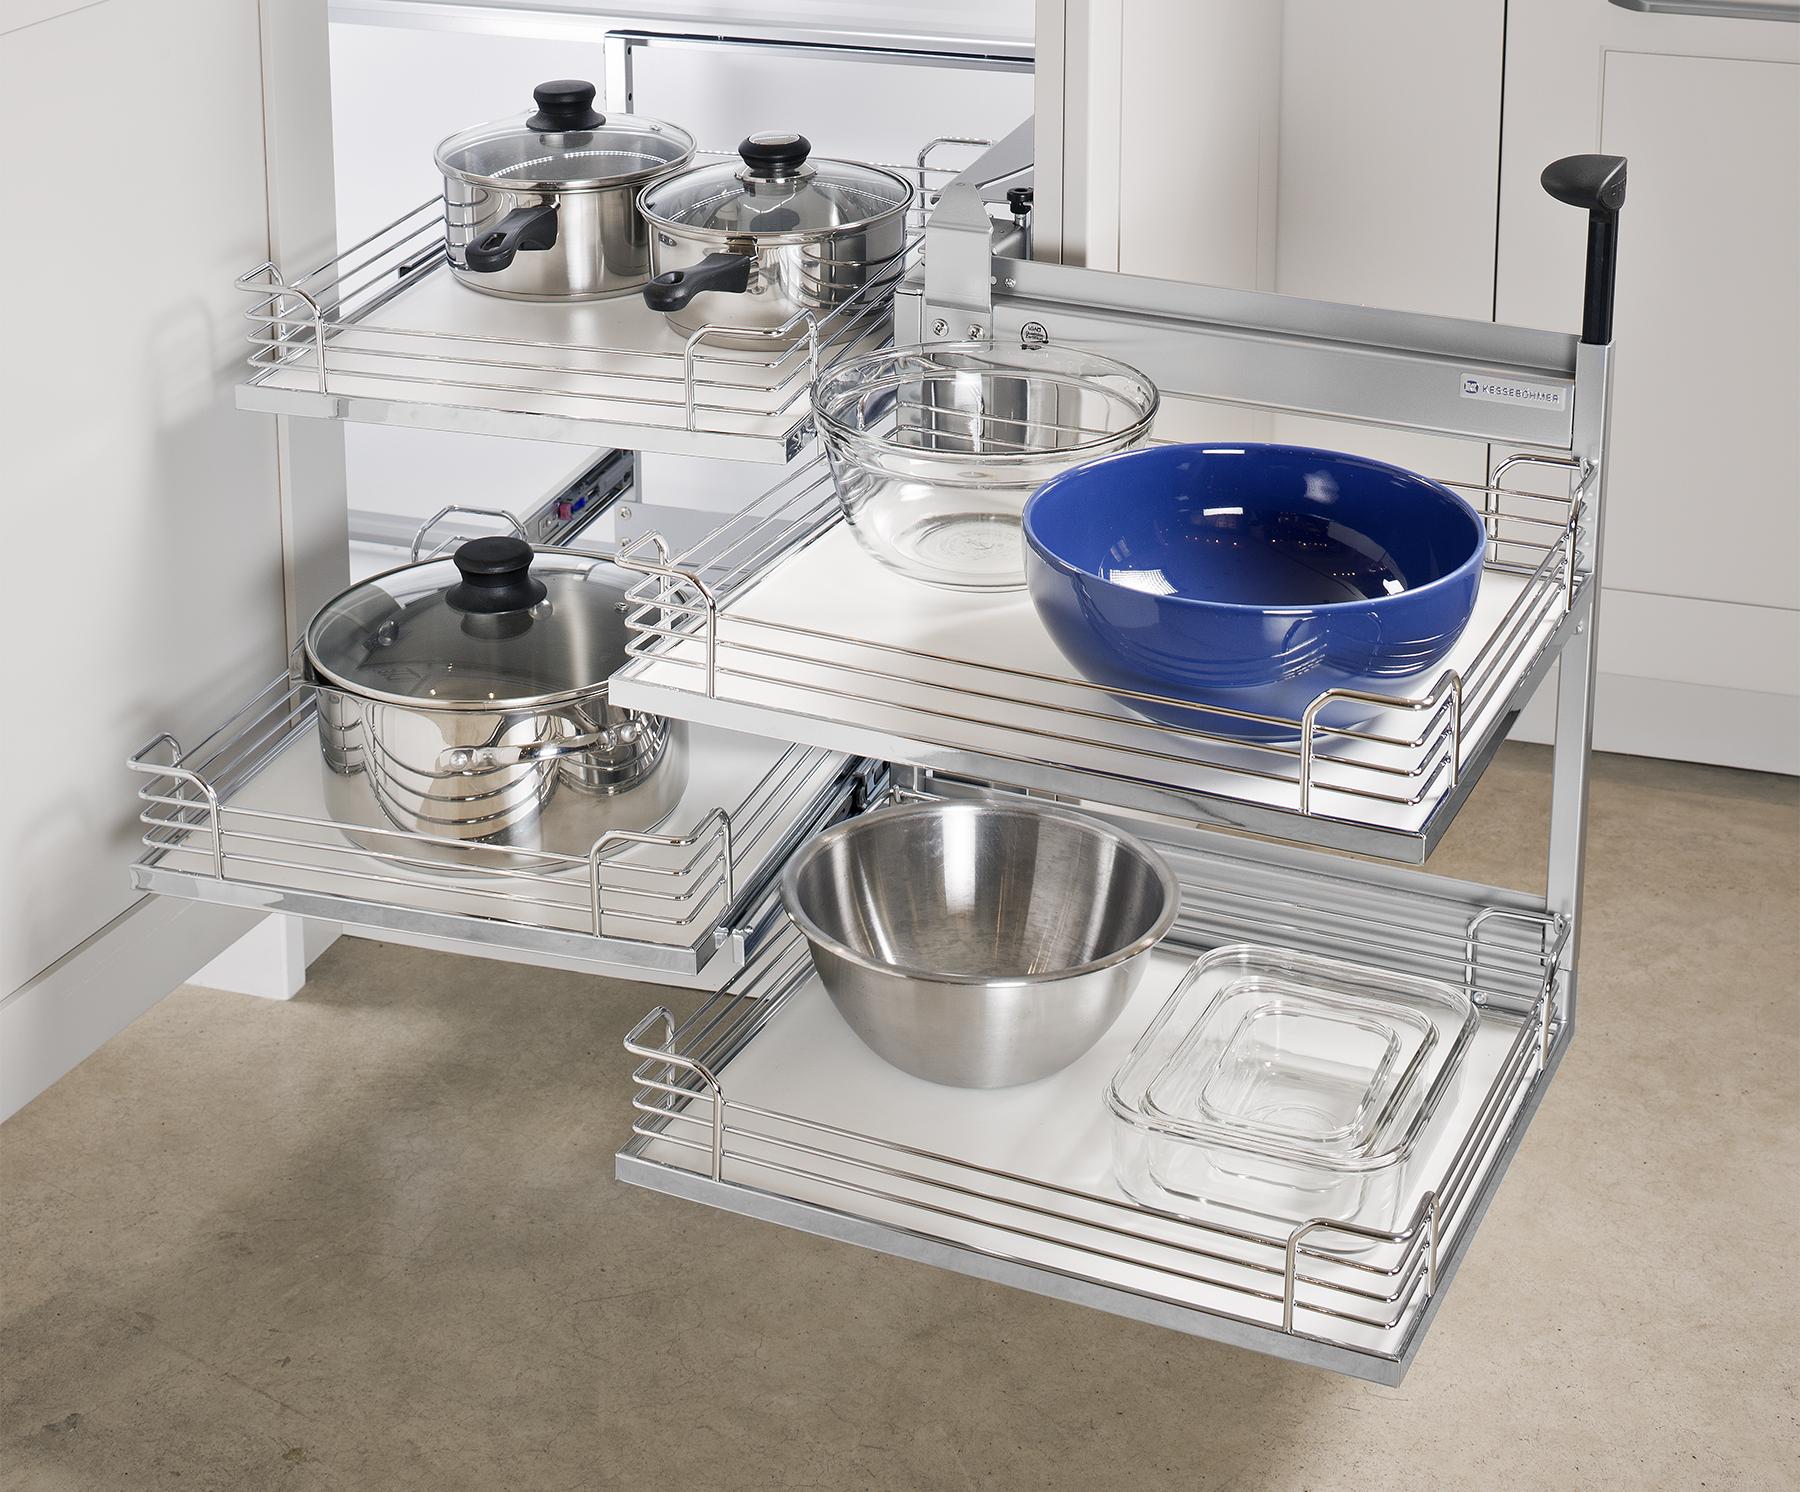 kitchen cabinet accessories plain fancy. Black Bedroom Furniture Sets. Home Design Ideas